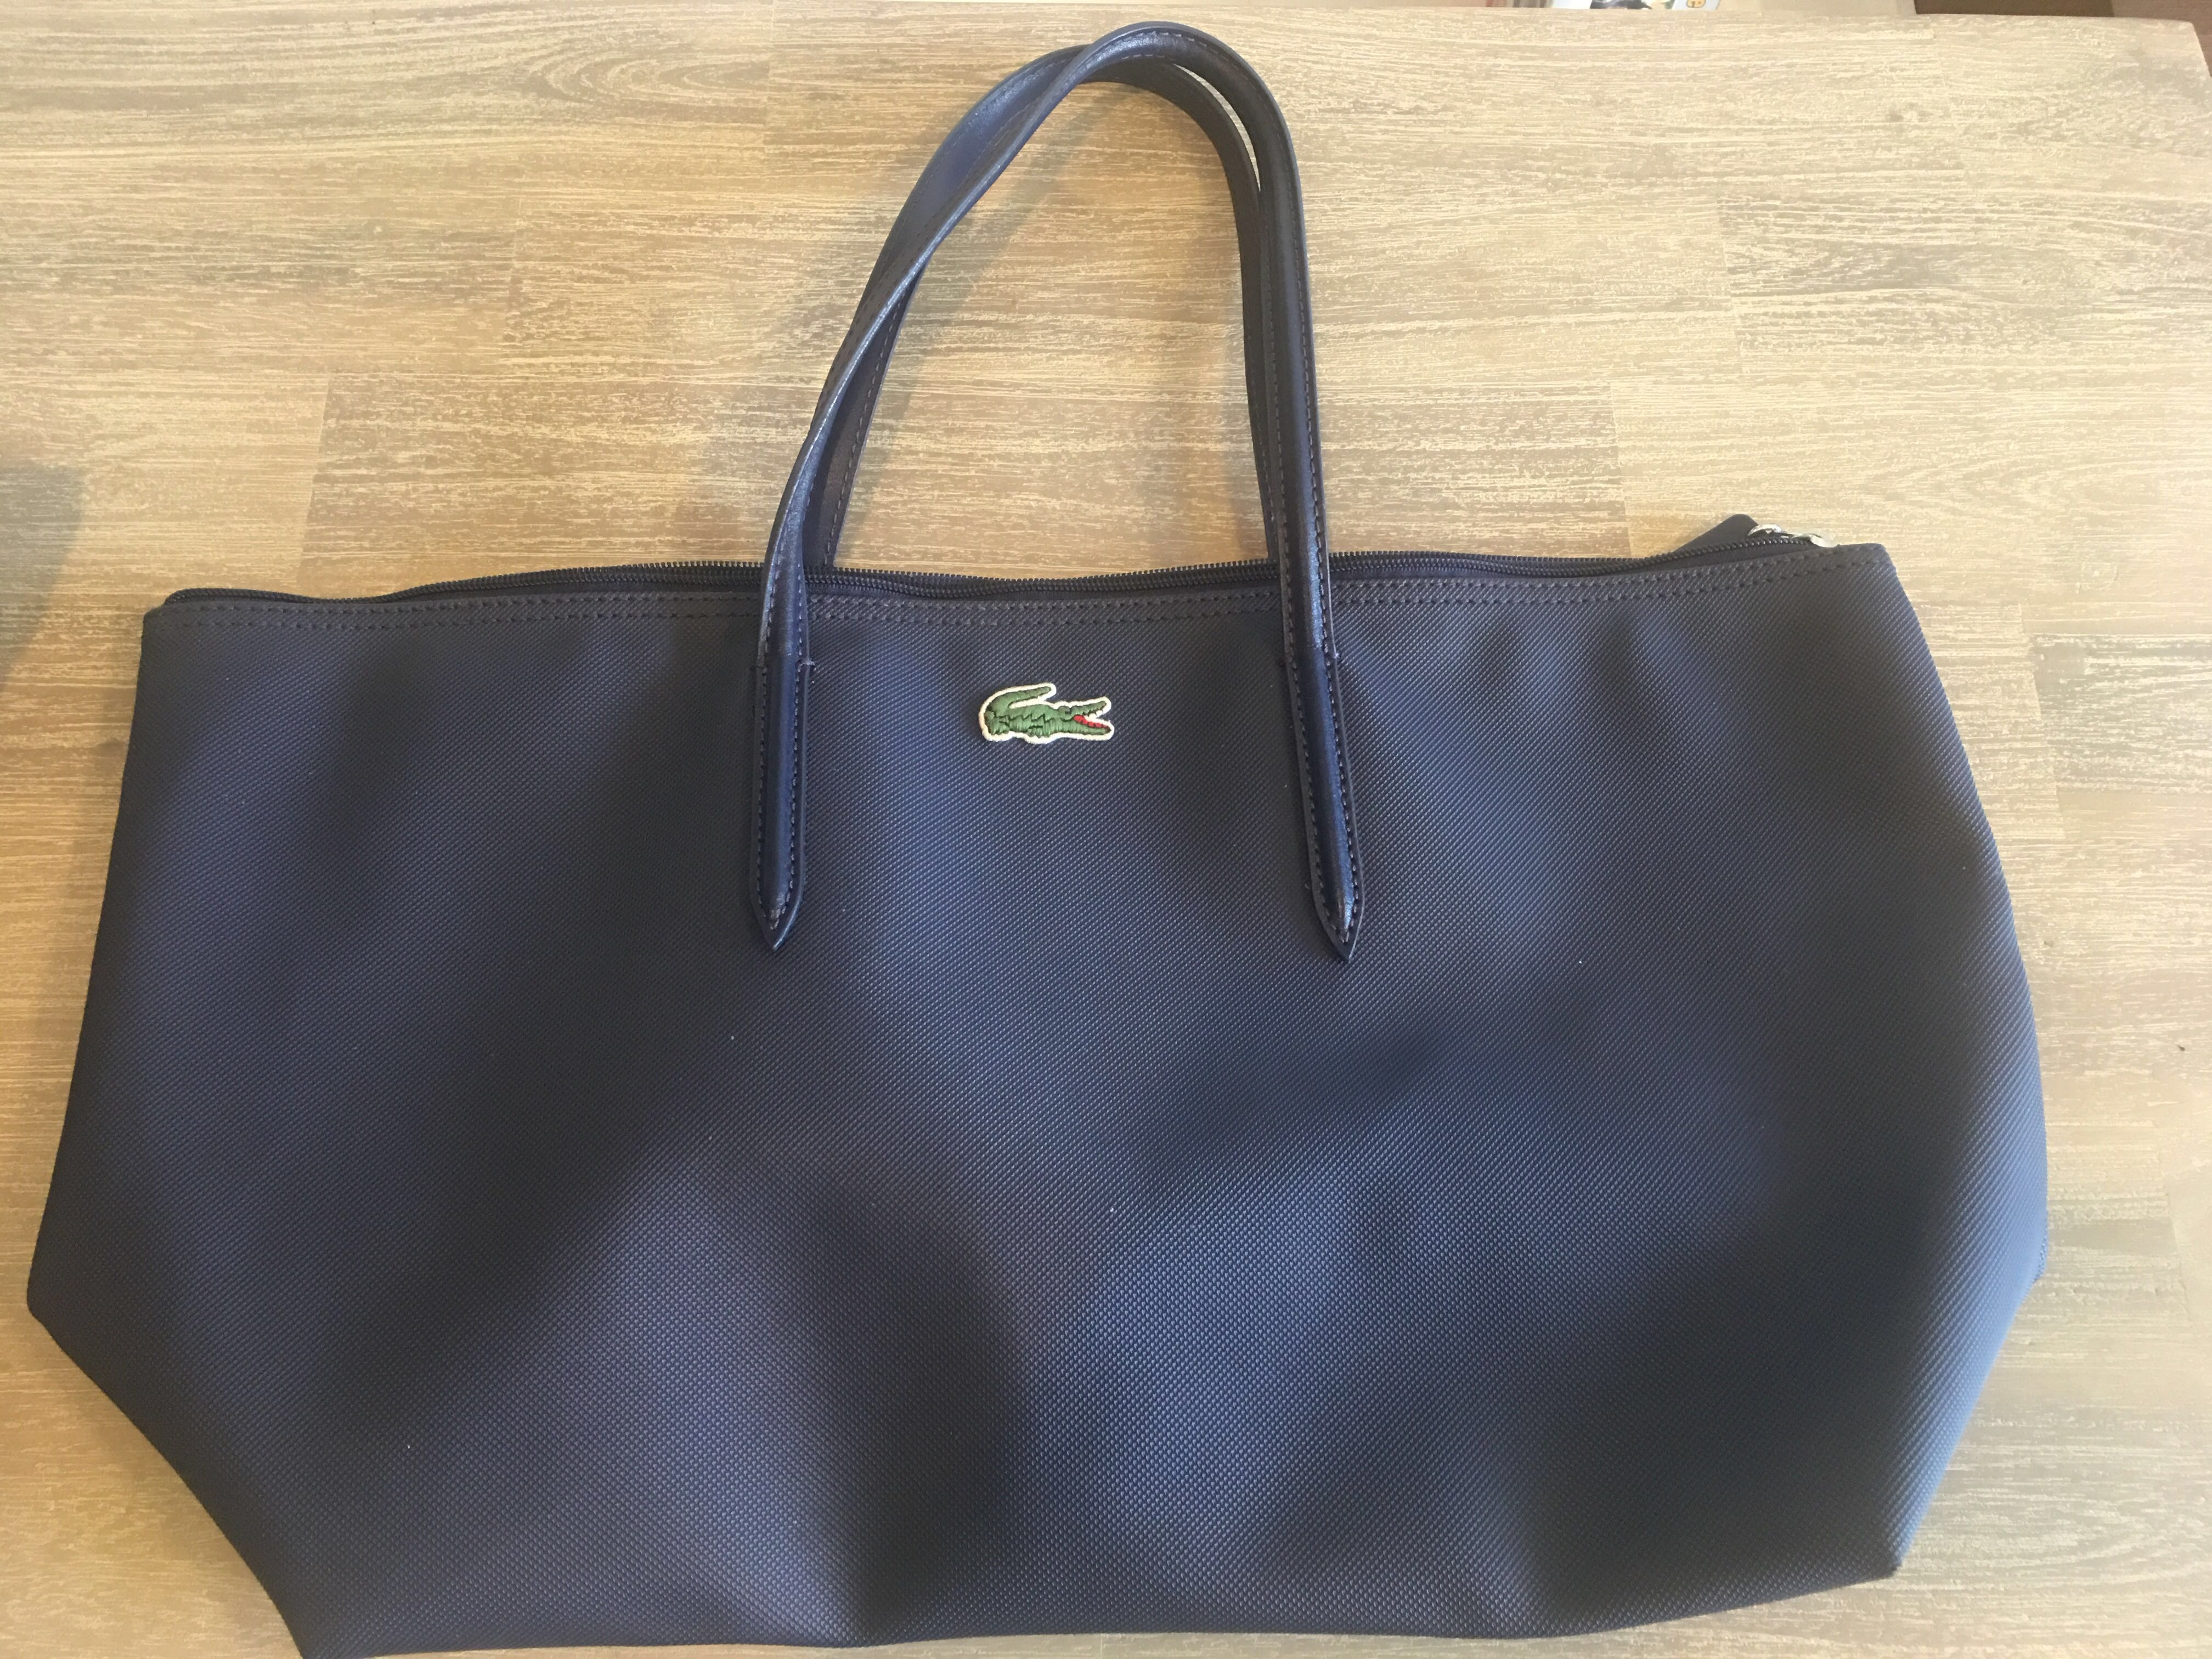 027879ae1b LACOSTE Tote Bag Navy, Women's Fashion, Bags & Wallets, Sling Bags ...